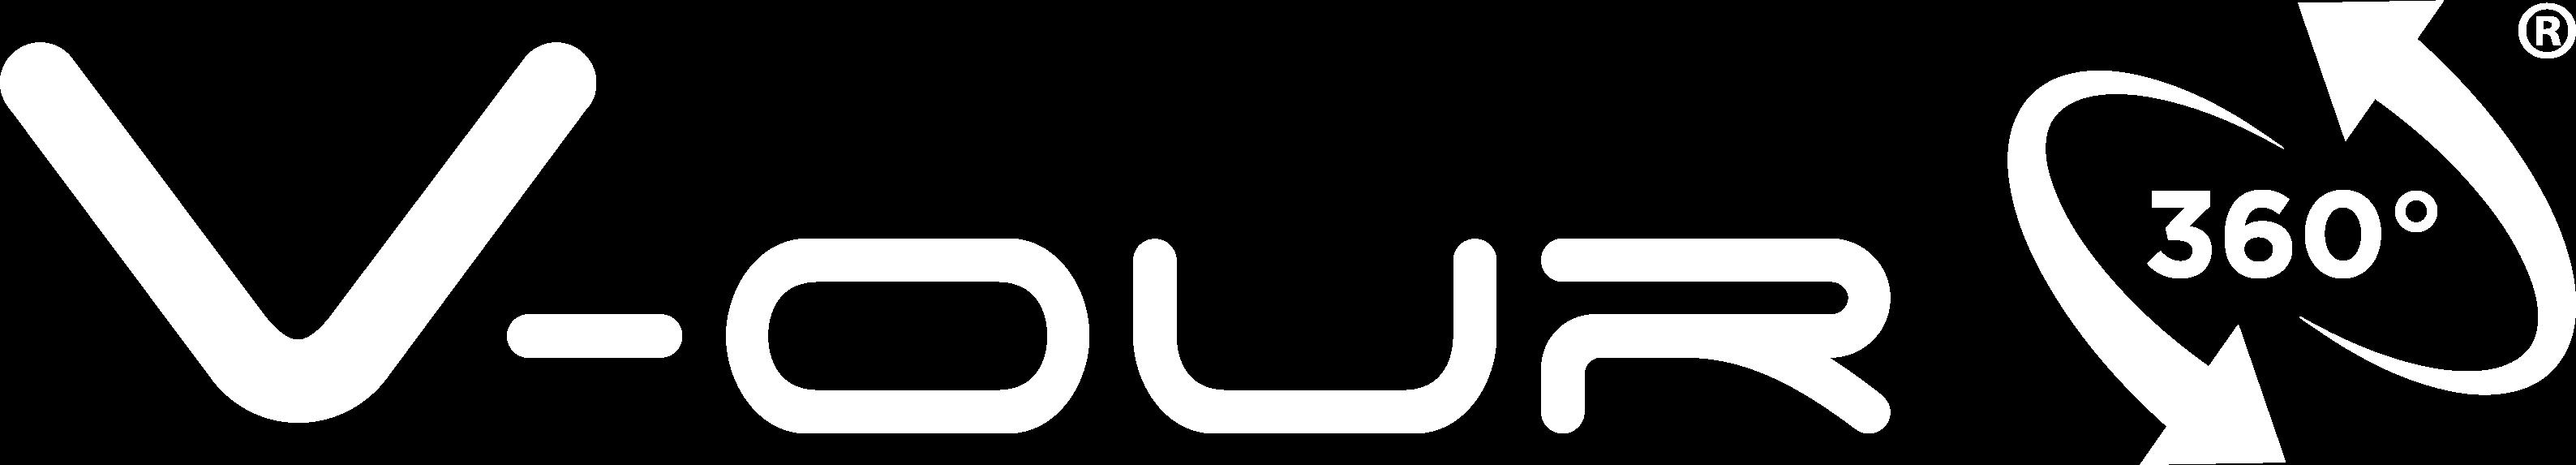 V-Our